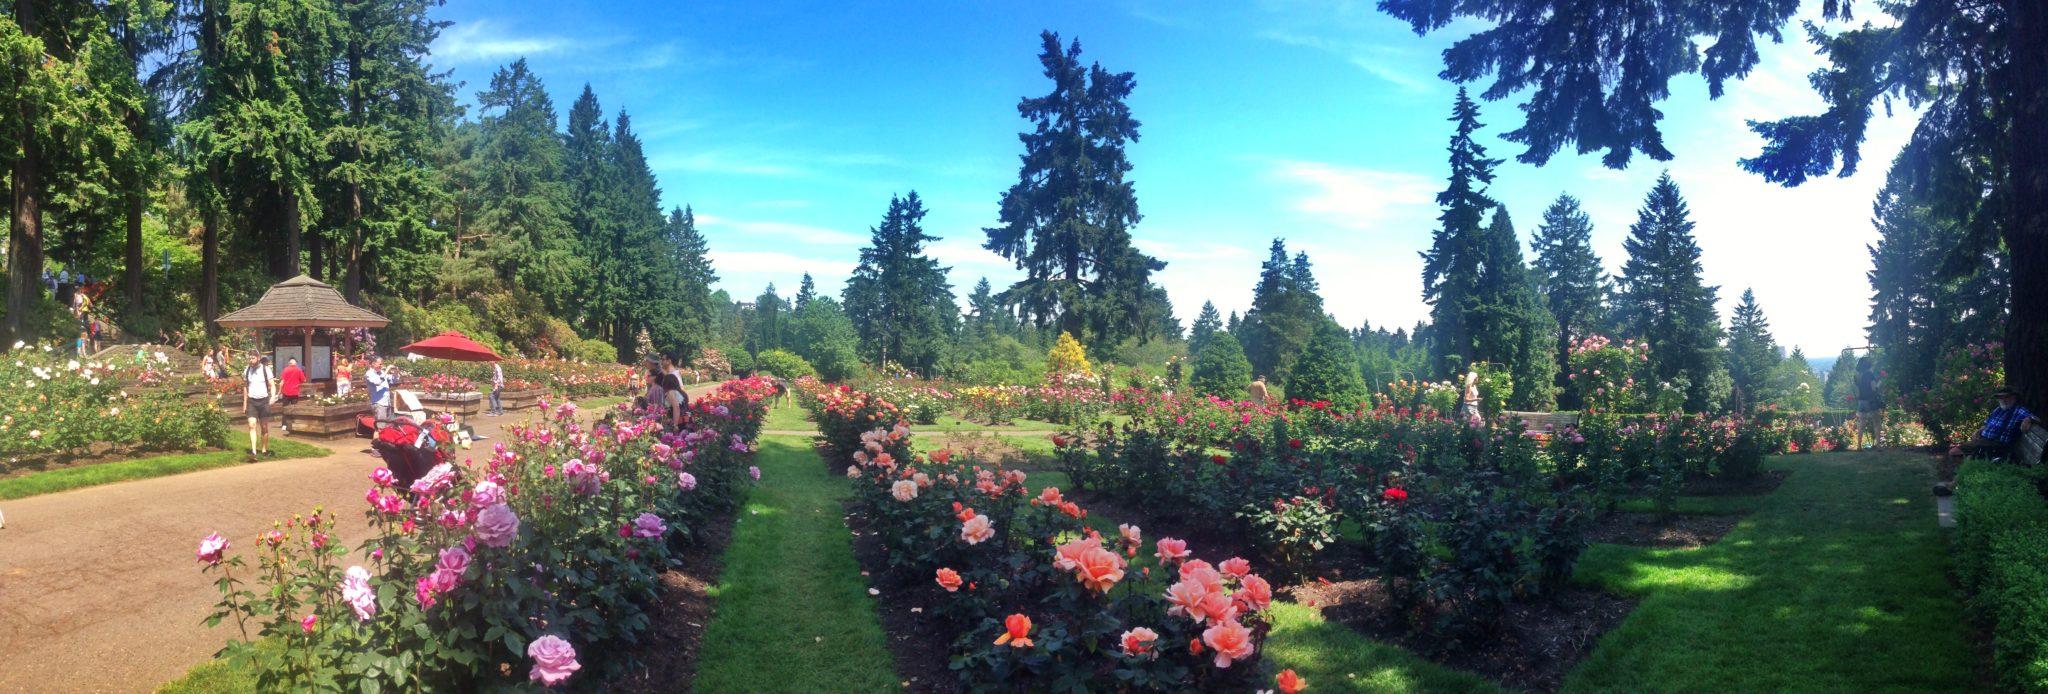 International Rose Test Garden, Washington Park, Portland, Oregon